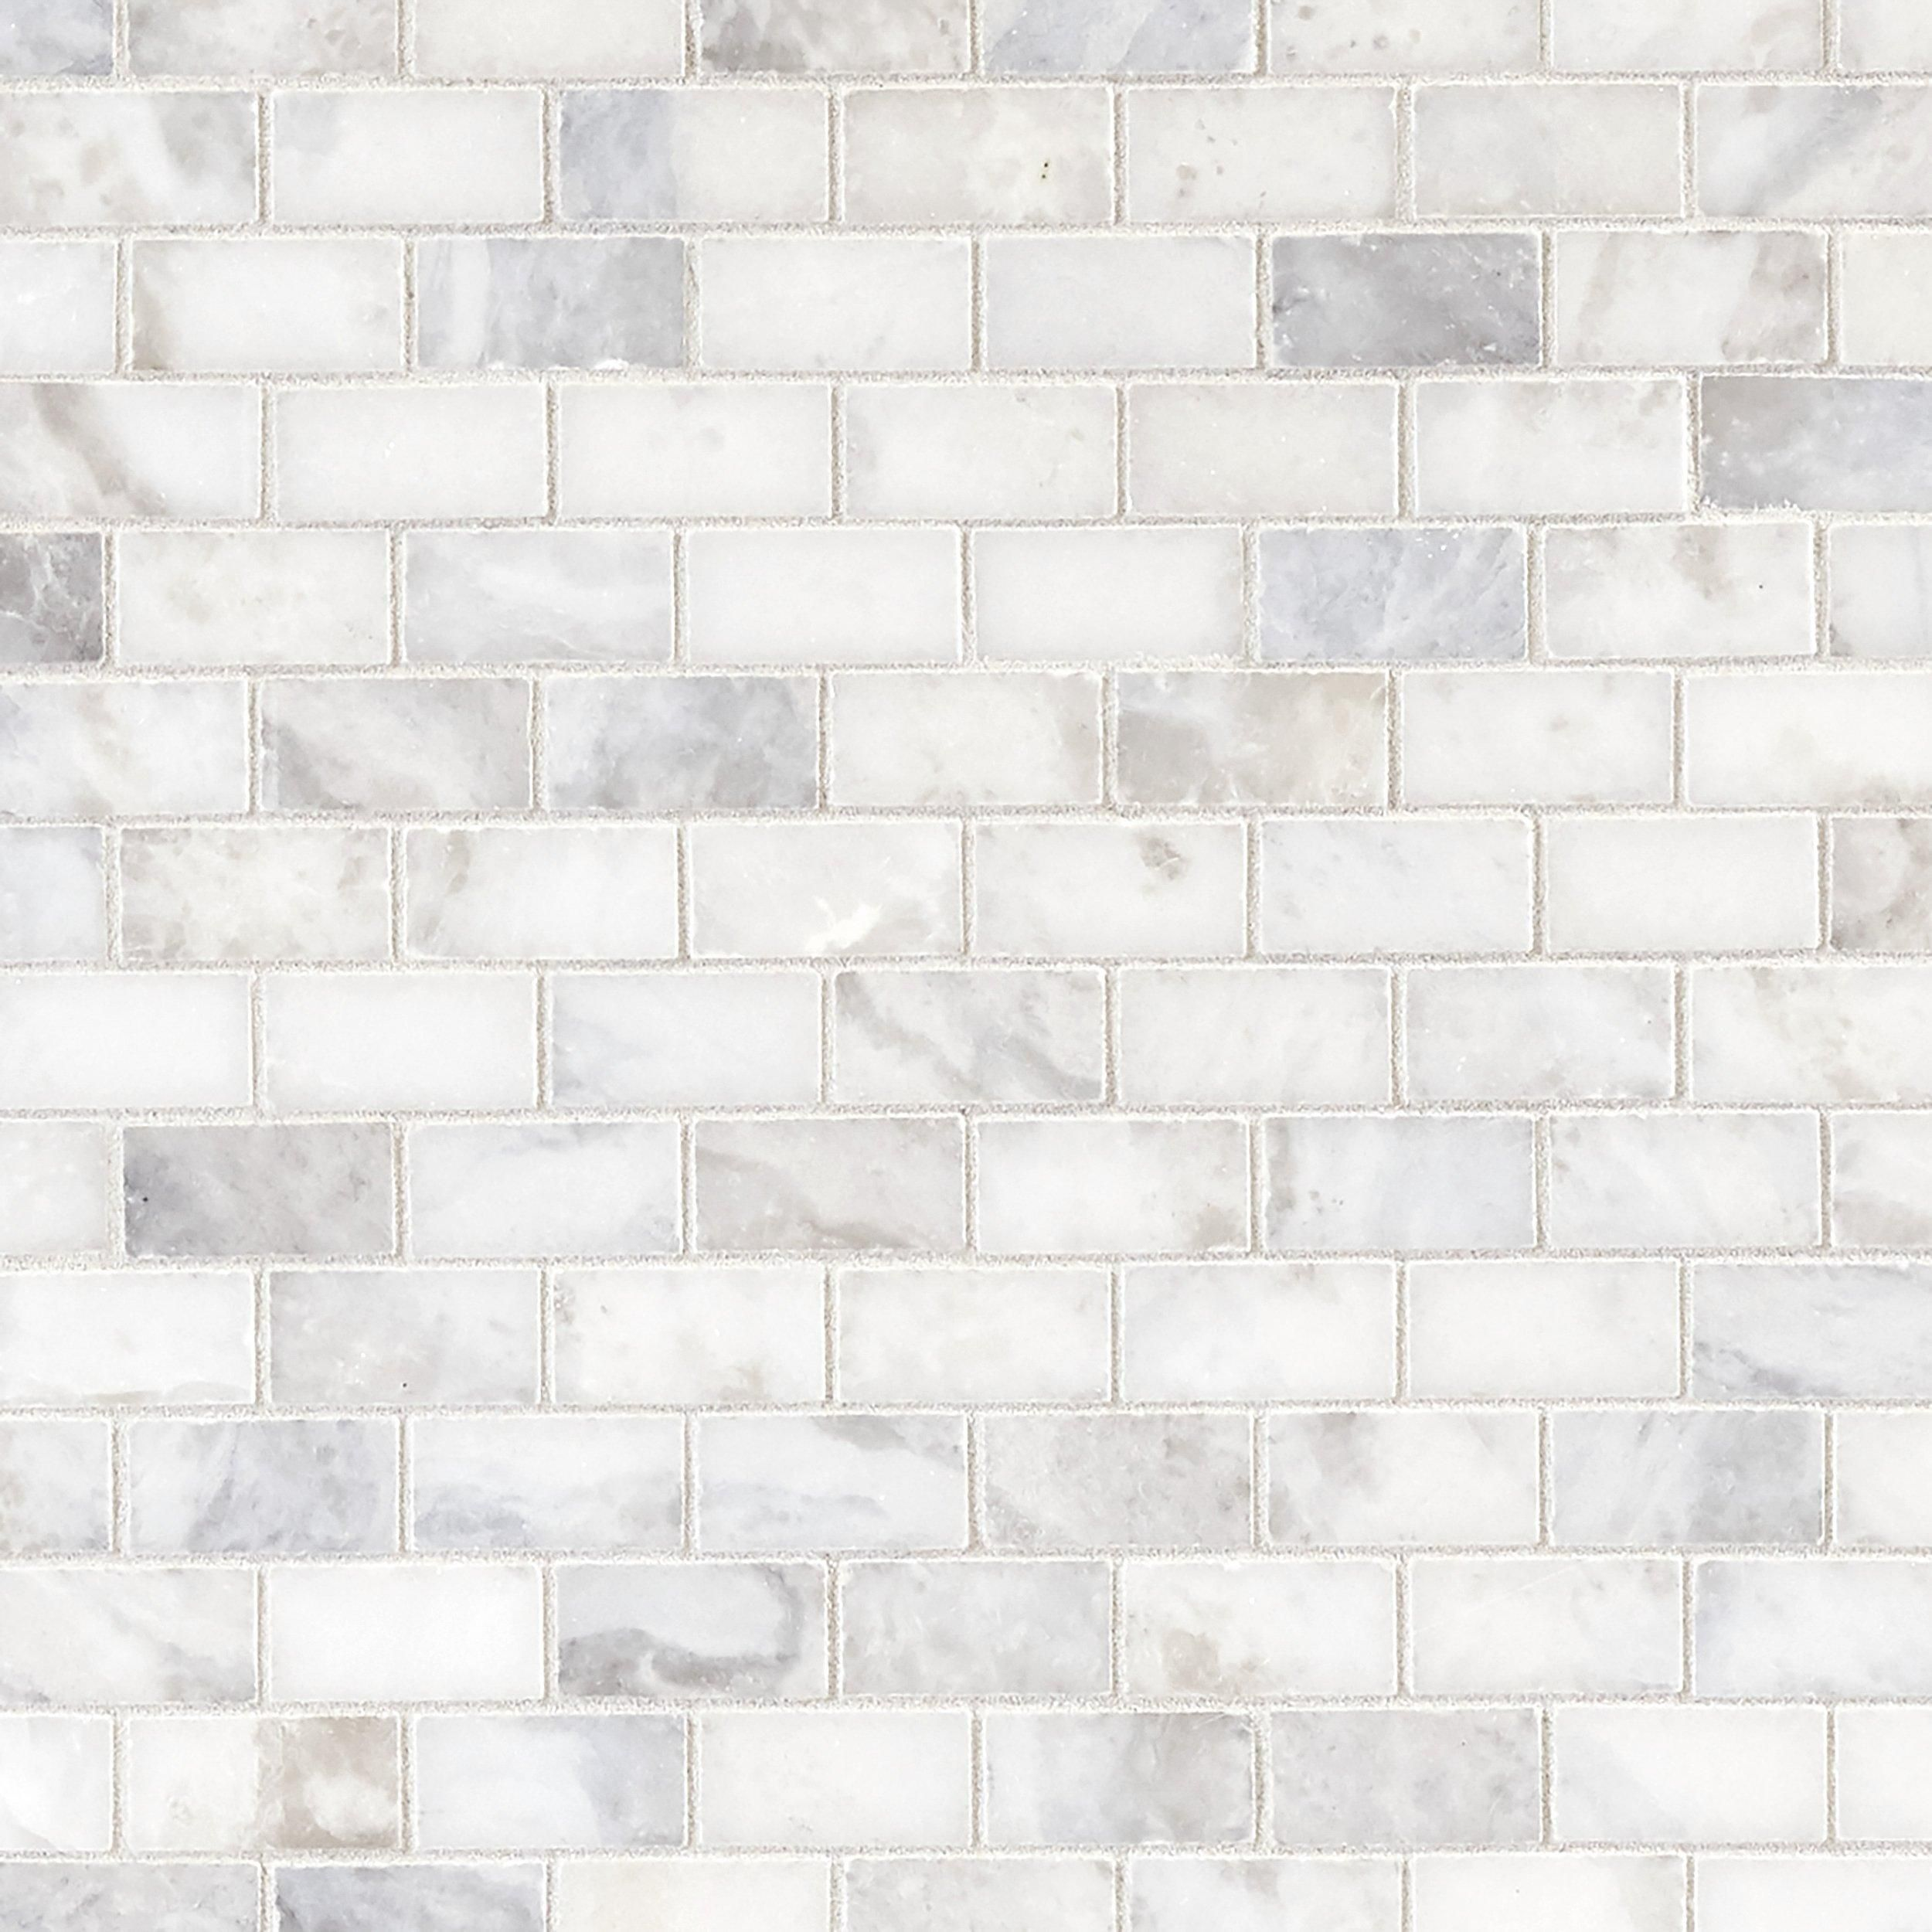 Sahara Carrara Brick Marble Mosaic Stone Decoratives Floor Decor In 2020 Marble Mosaic Carrara Marble Flooring